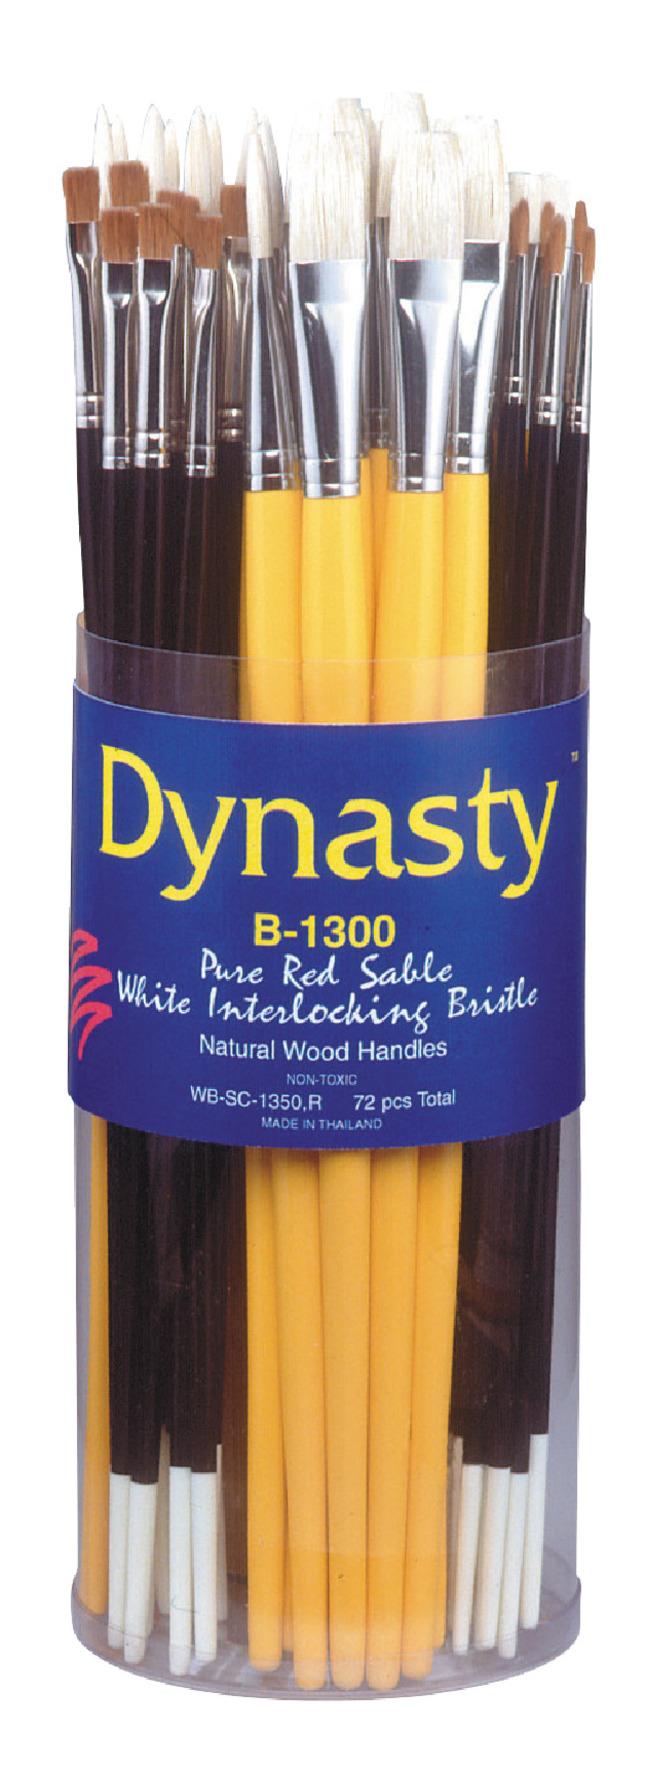 Paint Brushes, Item Number 401483